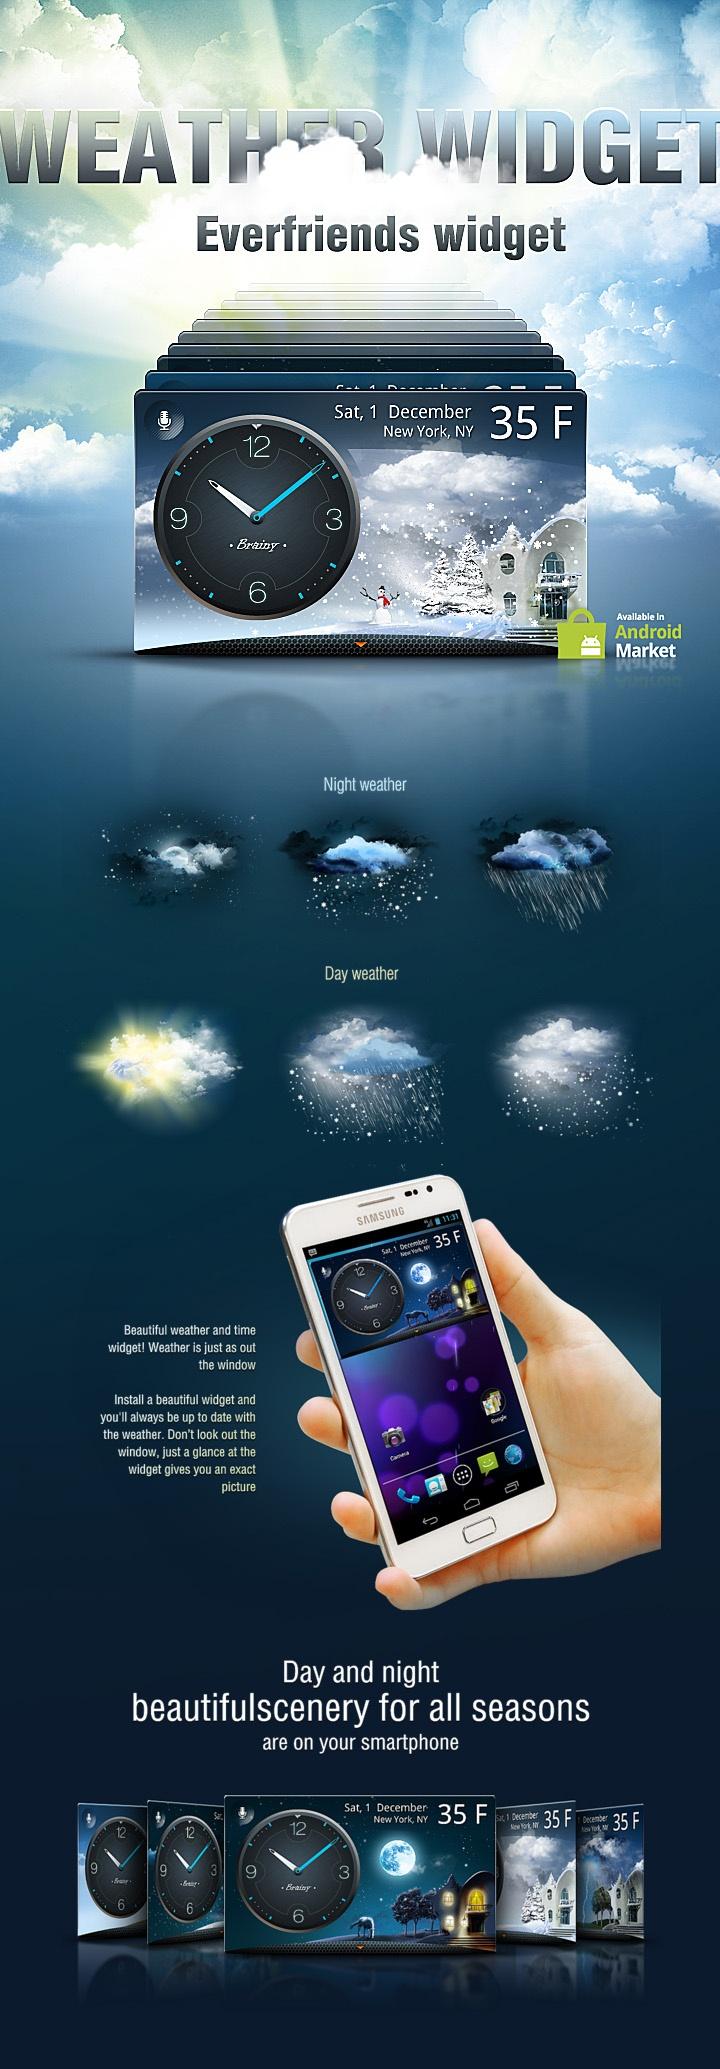 Everfriends widget by ad lopez, via Behance